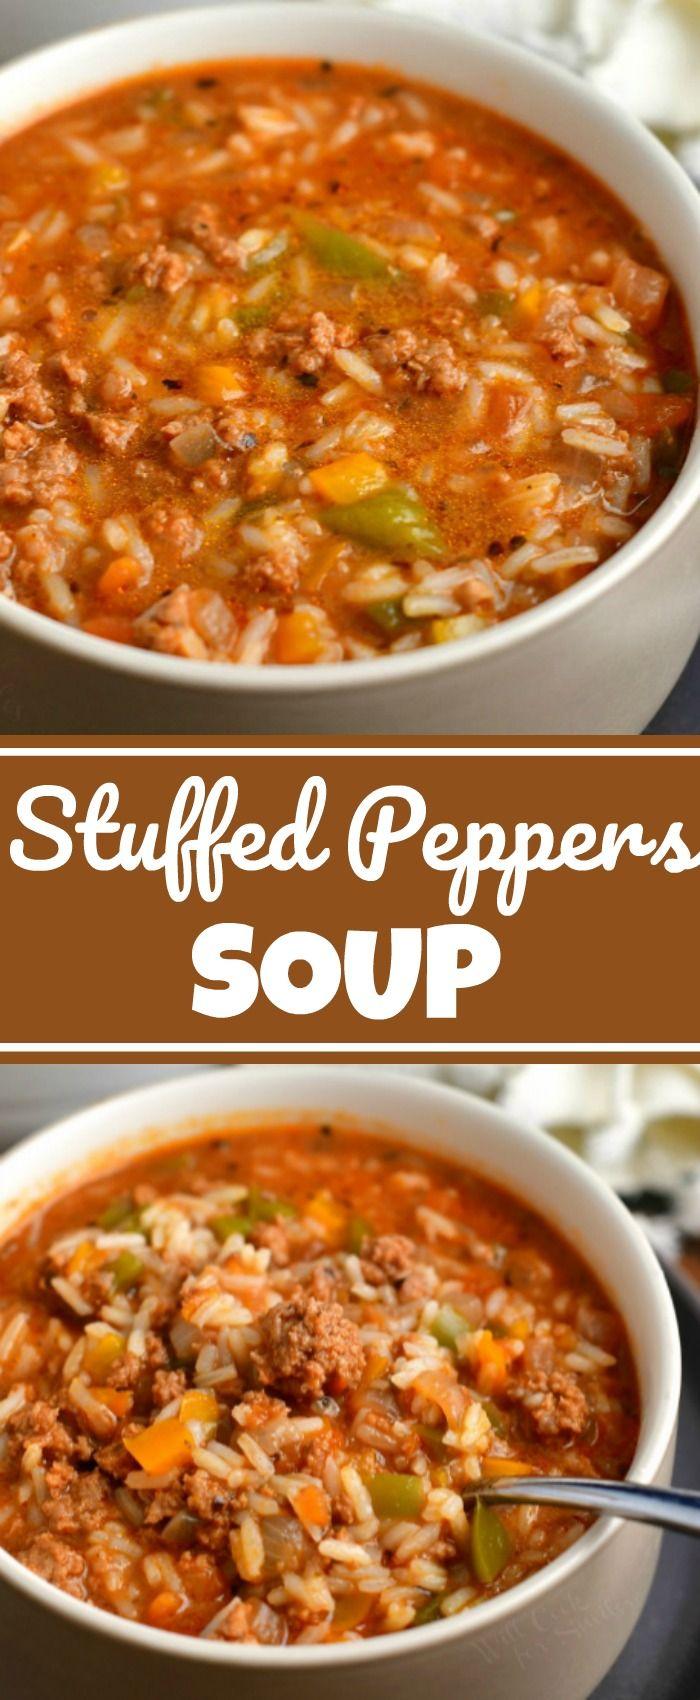 Homemade Stuffed Pepper Soup In 2020 Stuffed Peppers Stuffed Pepper Soup Recipes